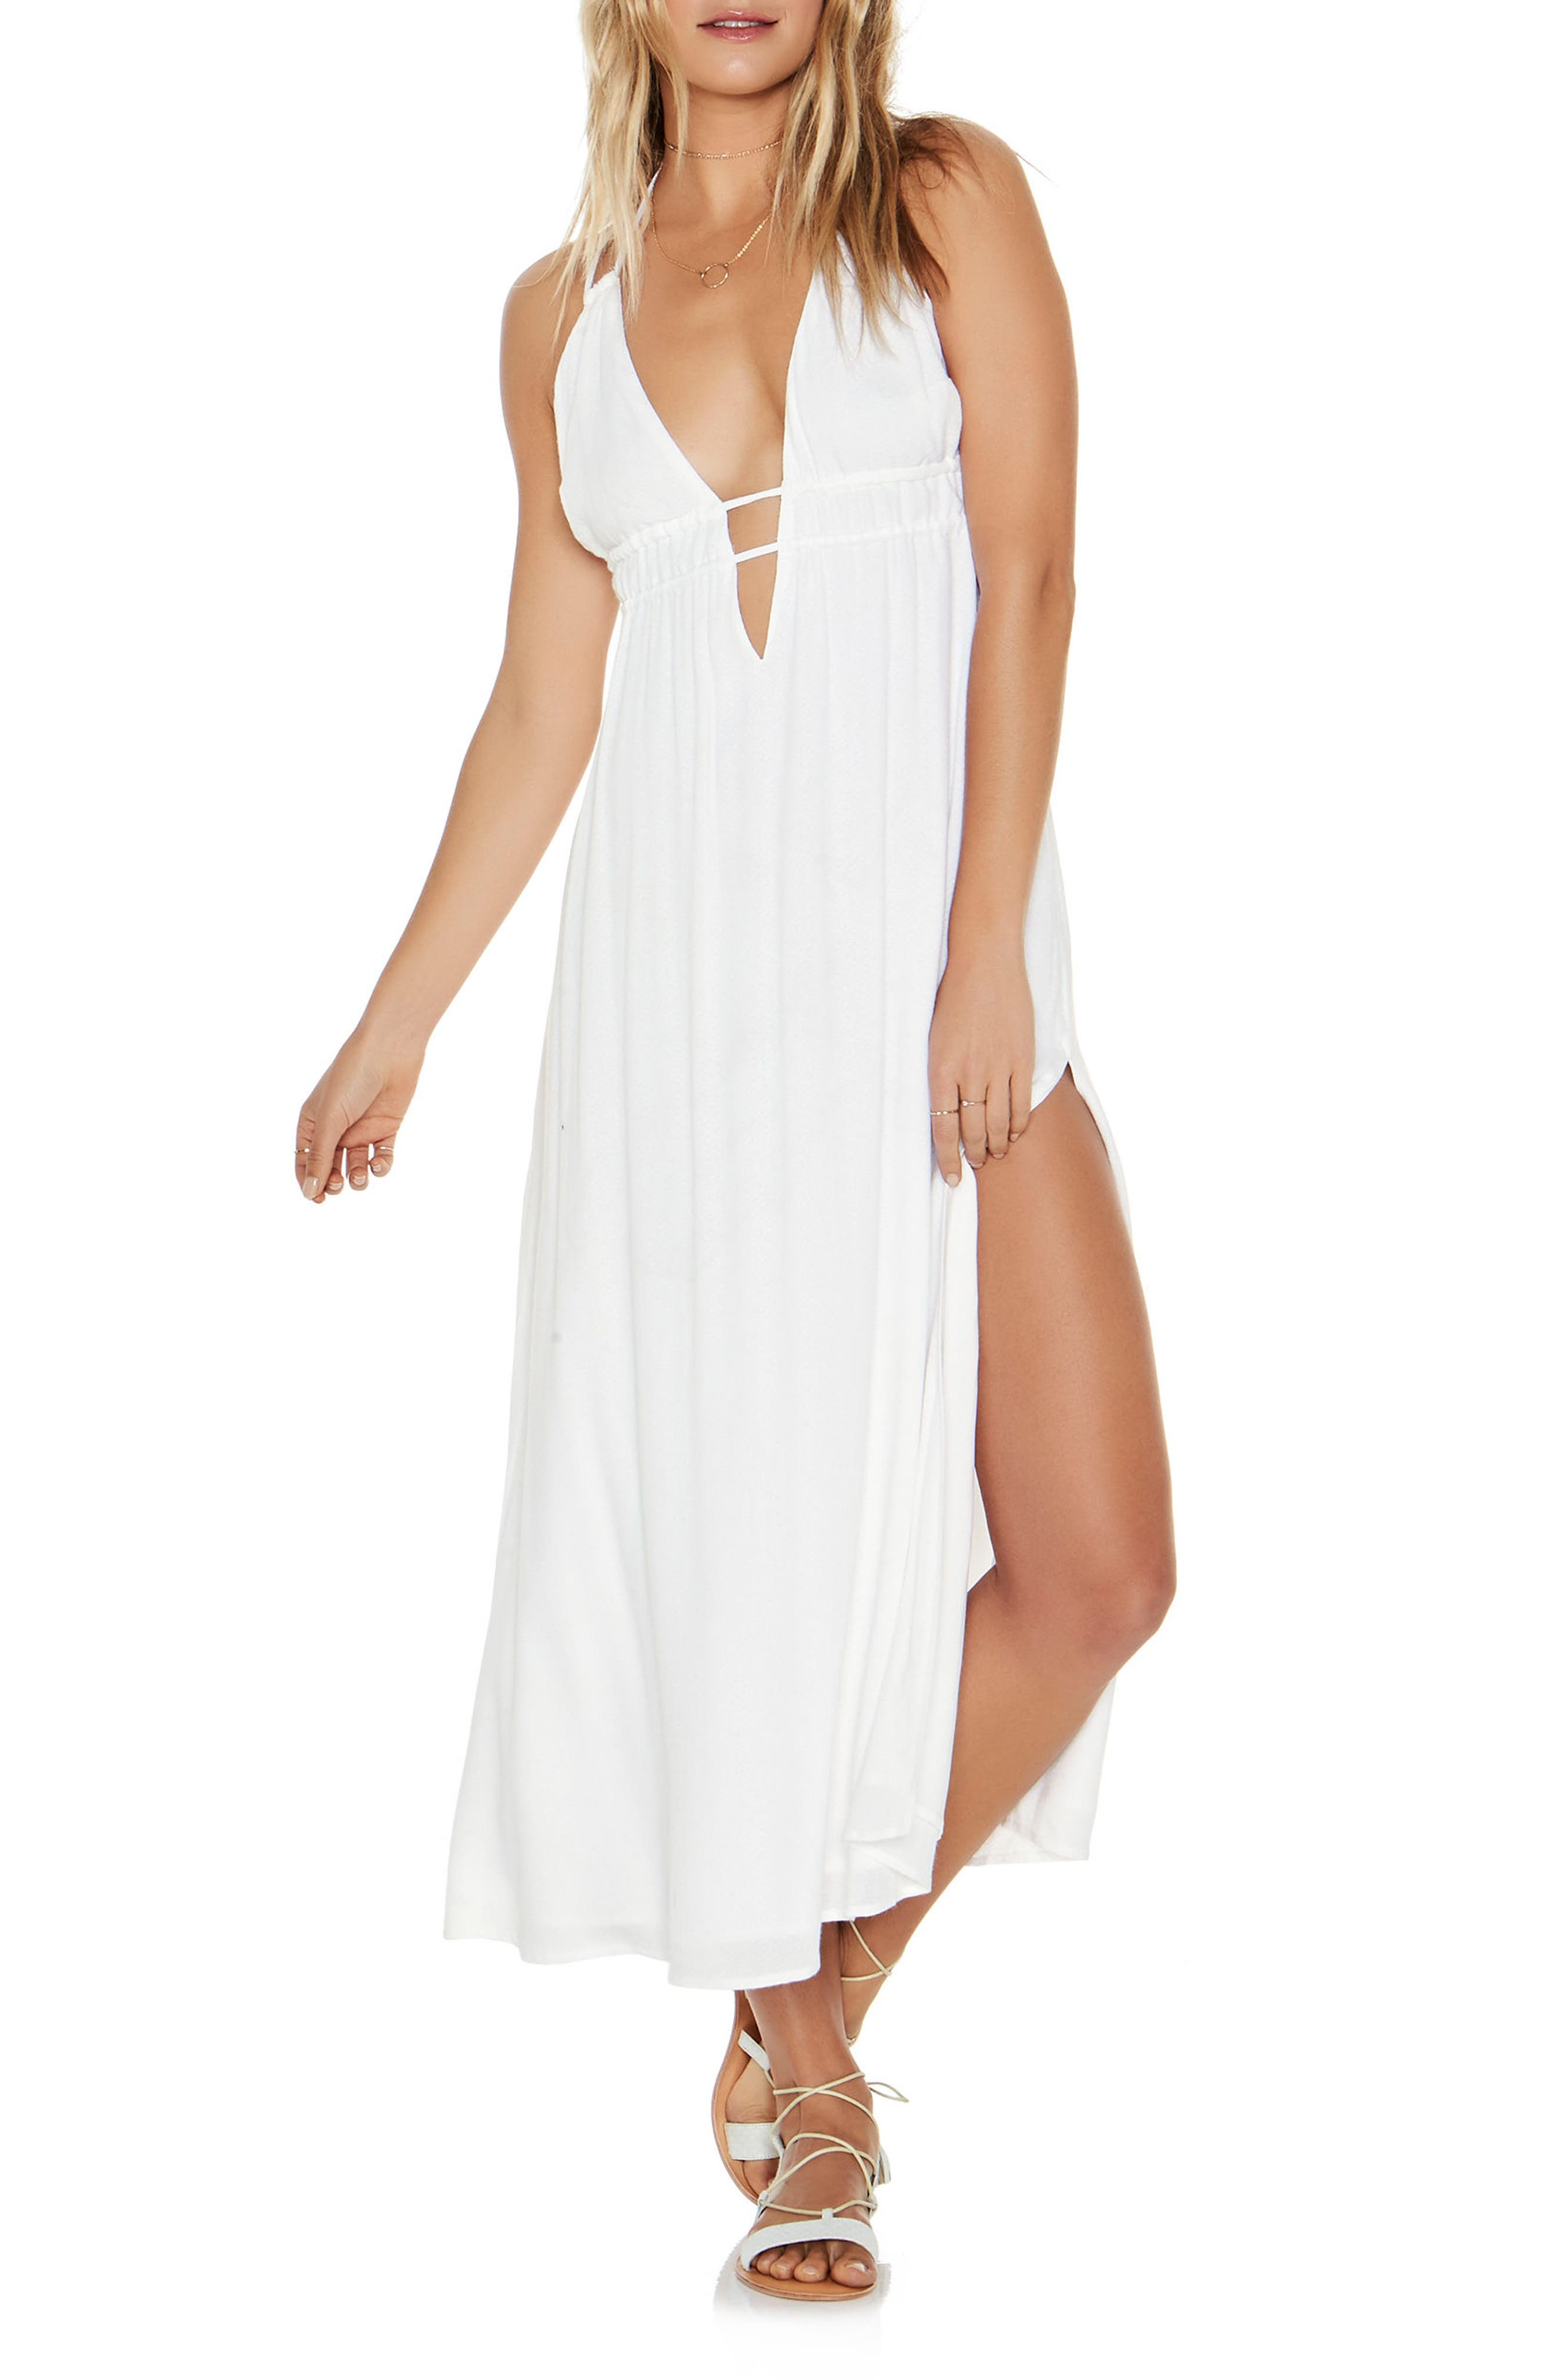 Beachside Beauty Cover-Up Dress,                             Main thumbnail 1, color,                             White